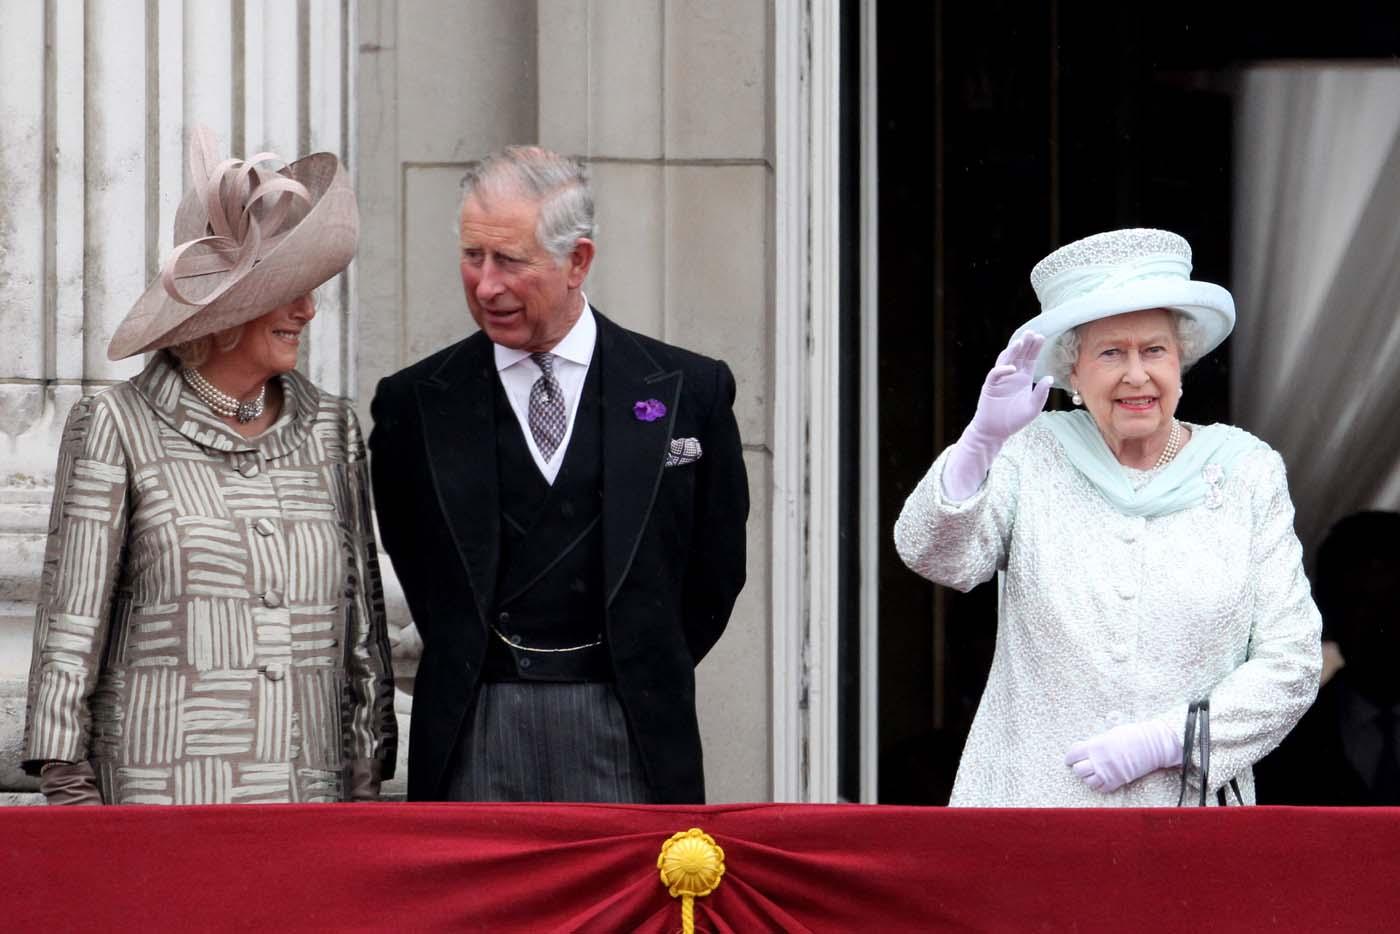 Balcony for Queen on balcony